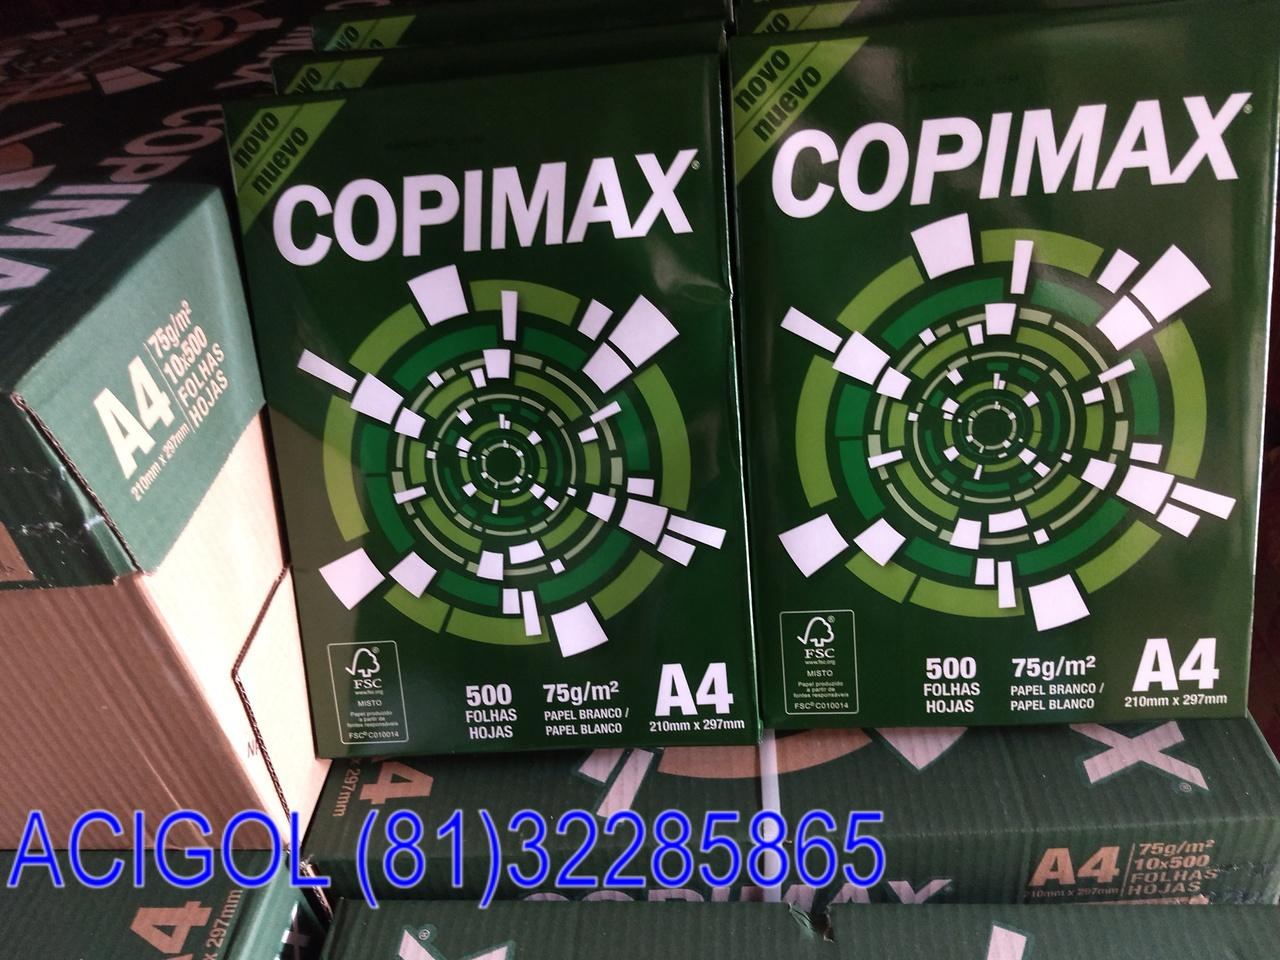 PAPEL A4 COPIMAX-ACIGOL RECIFE 81 32285865-IMG_20180828_135836644_LL